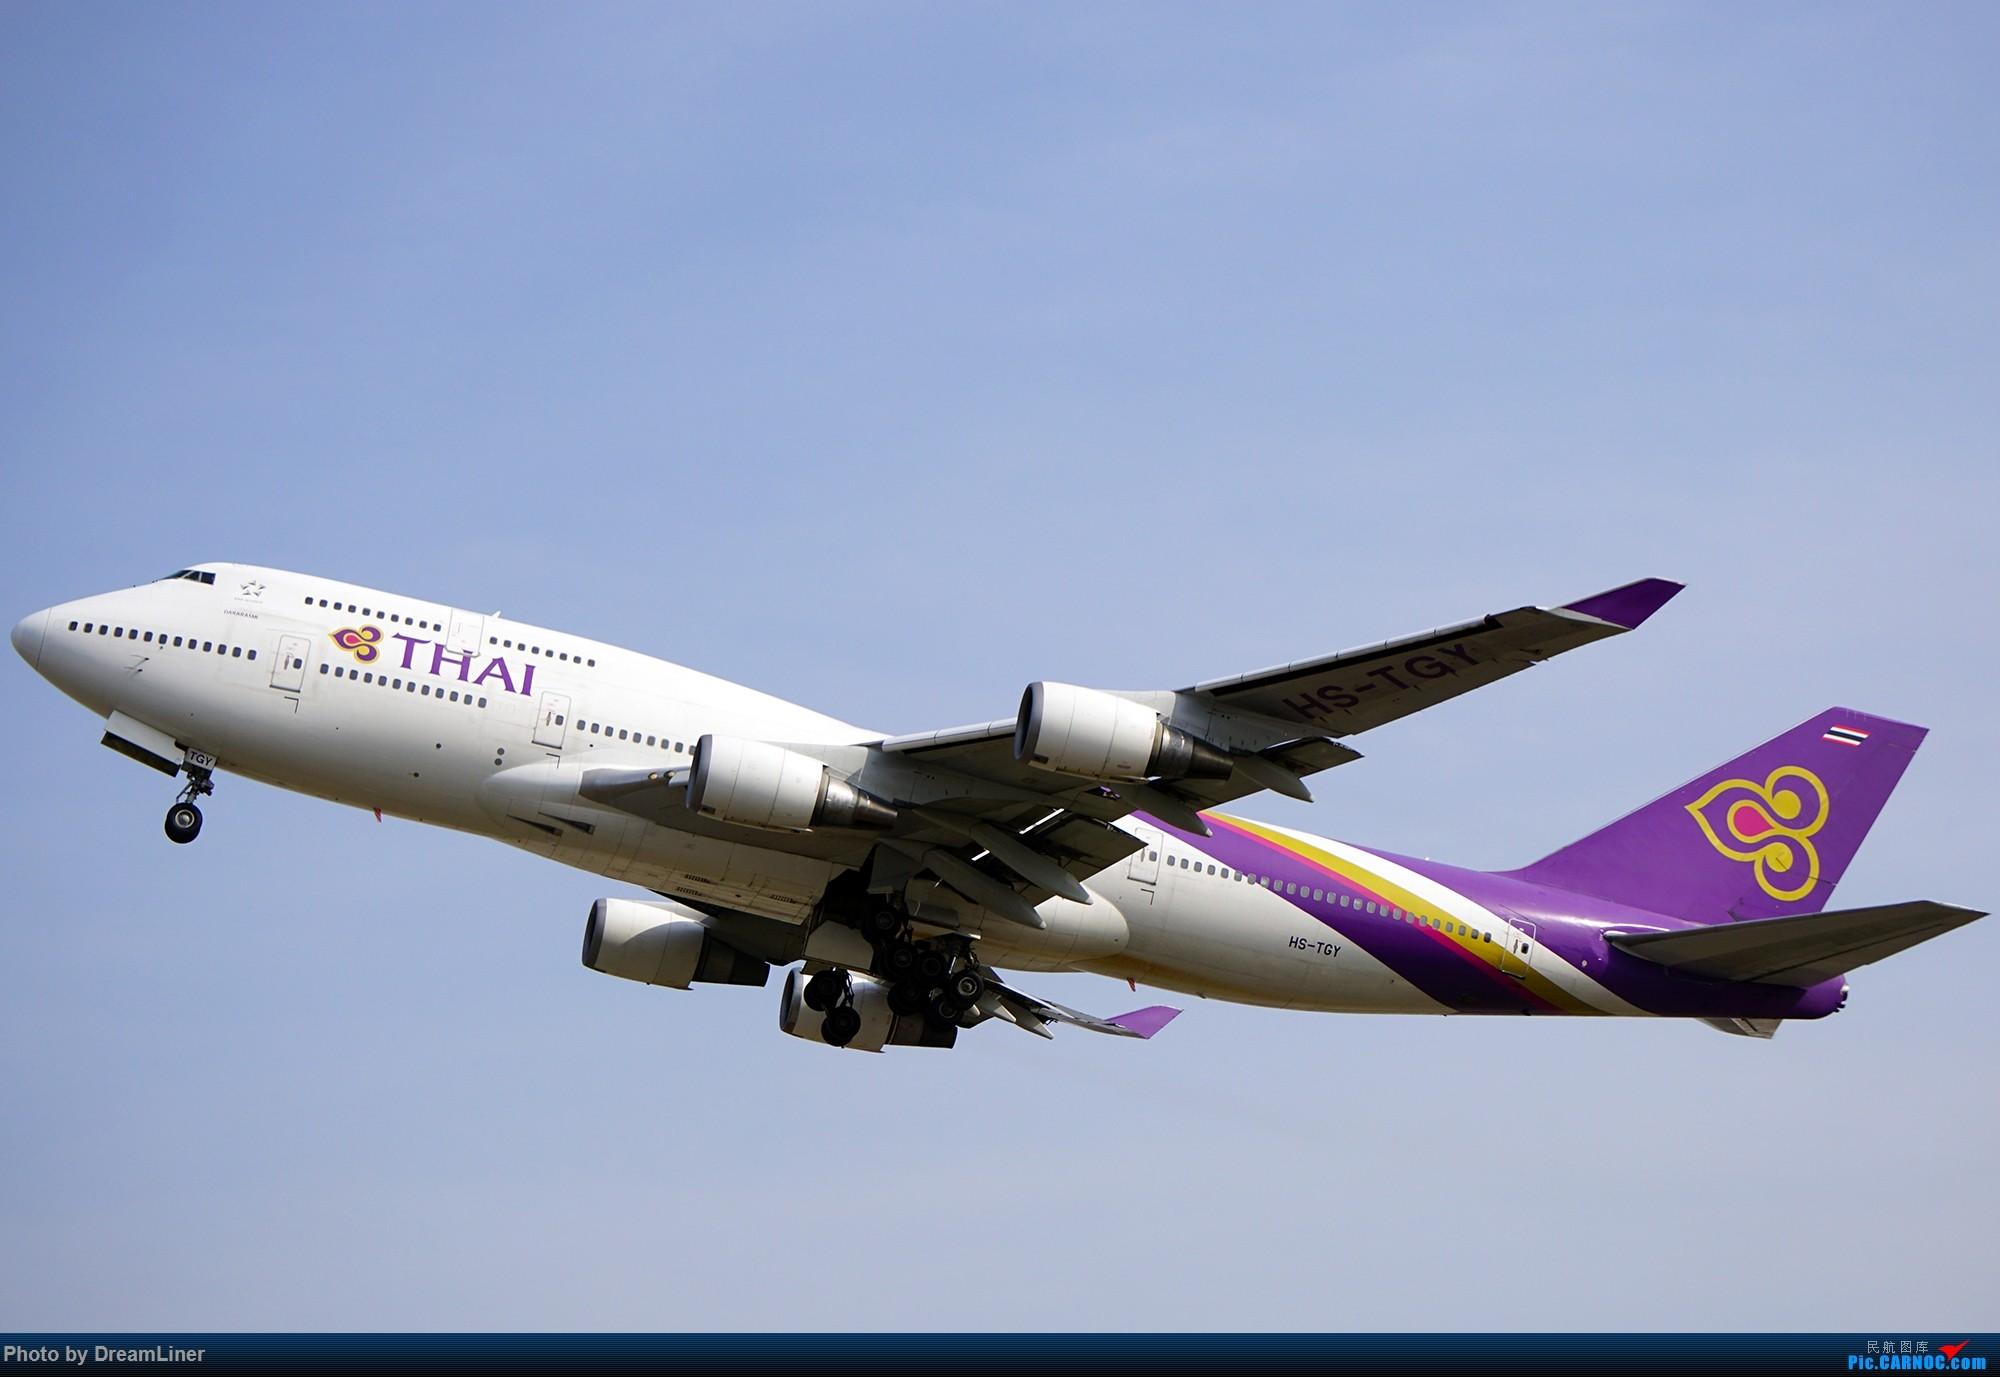 Re:[原创]17年暑假和今年寒假的ZGGG拍机成果 BOEING 747-400 HS-TGY 中国广州白云国际机场